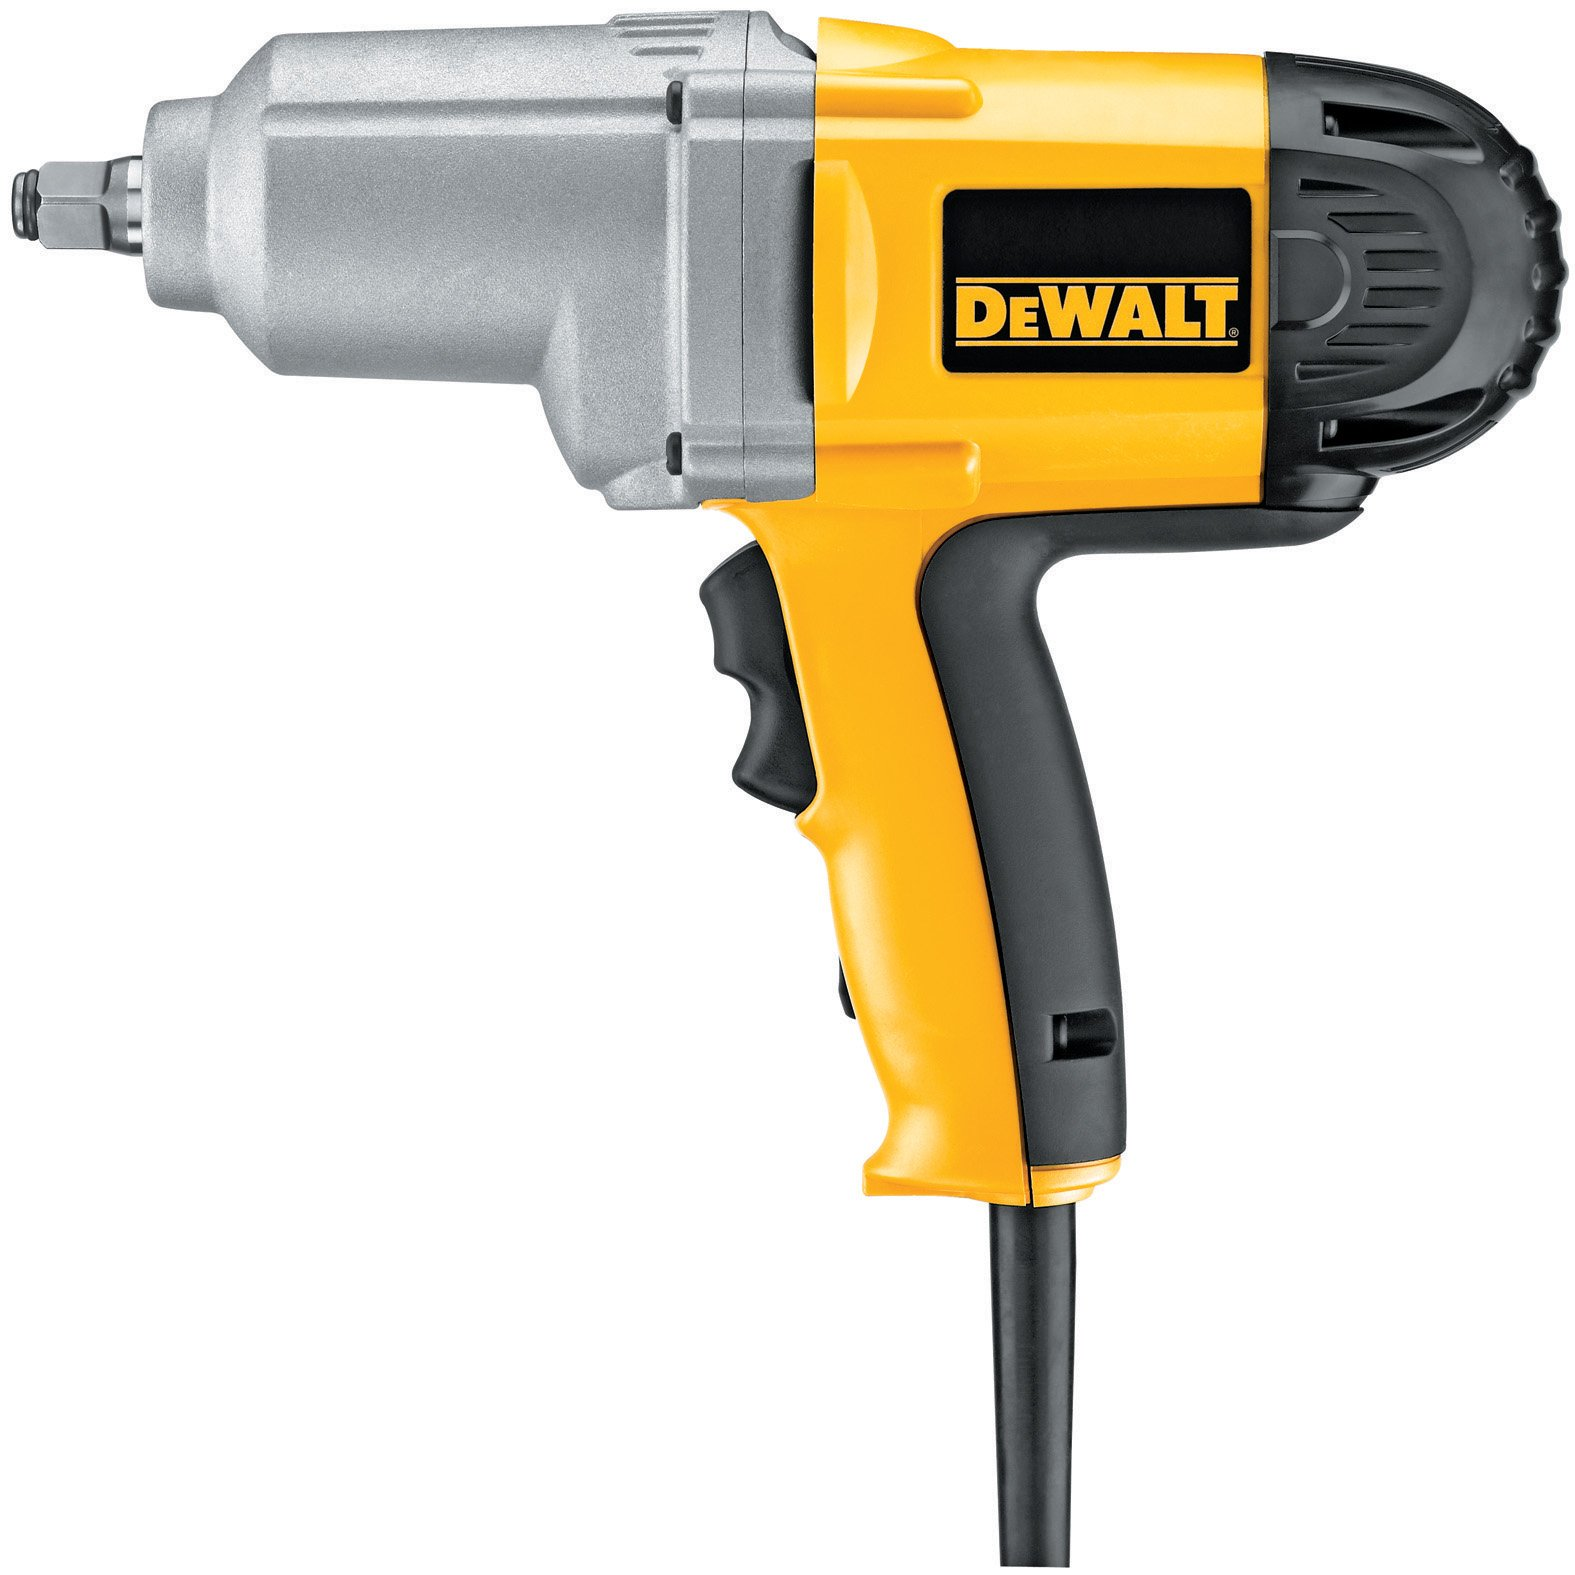 DEWALT DW293 7.5-Amp 1/2-Inch Impact Wrench with Hog Ring Anvil